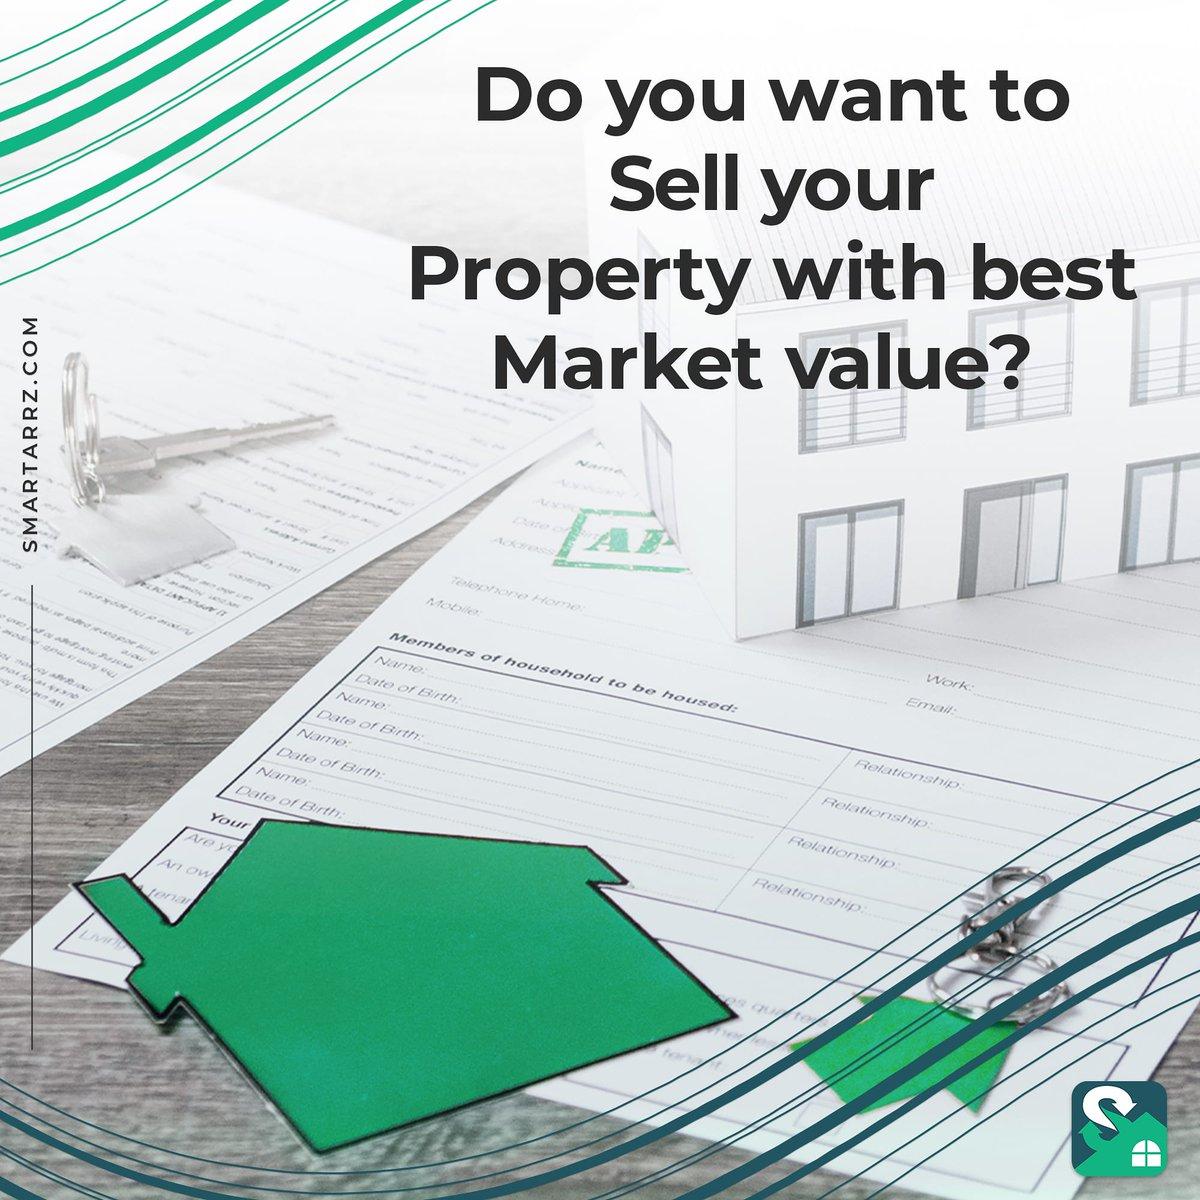 Apne Shar main Apna Makan  Islamabad Capital City  - In Your Own City  - In Your Nearest Area  . . . #smartarrz #sell #property #propertymanagement #Pakistan #realestate #buy #properties #buyproperty #Portal #PropertyPortal #comingsoon #verysoon